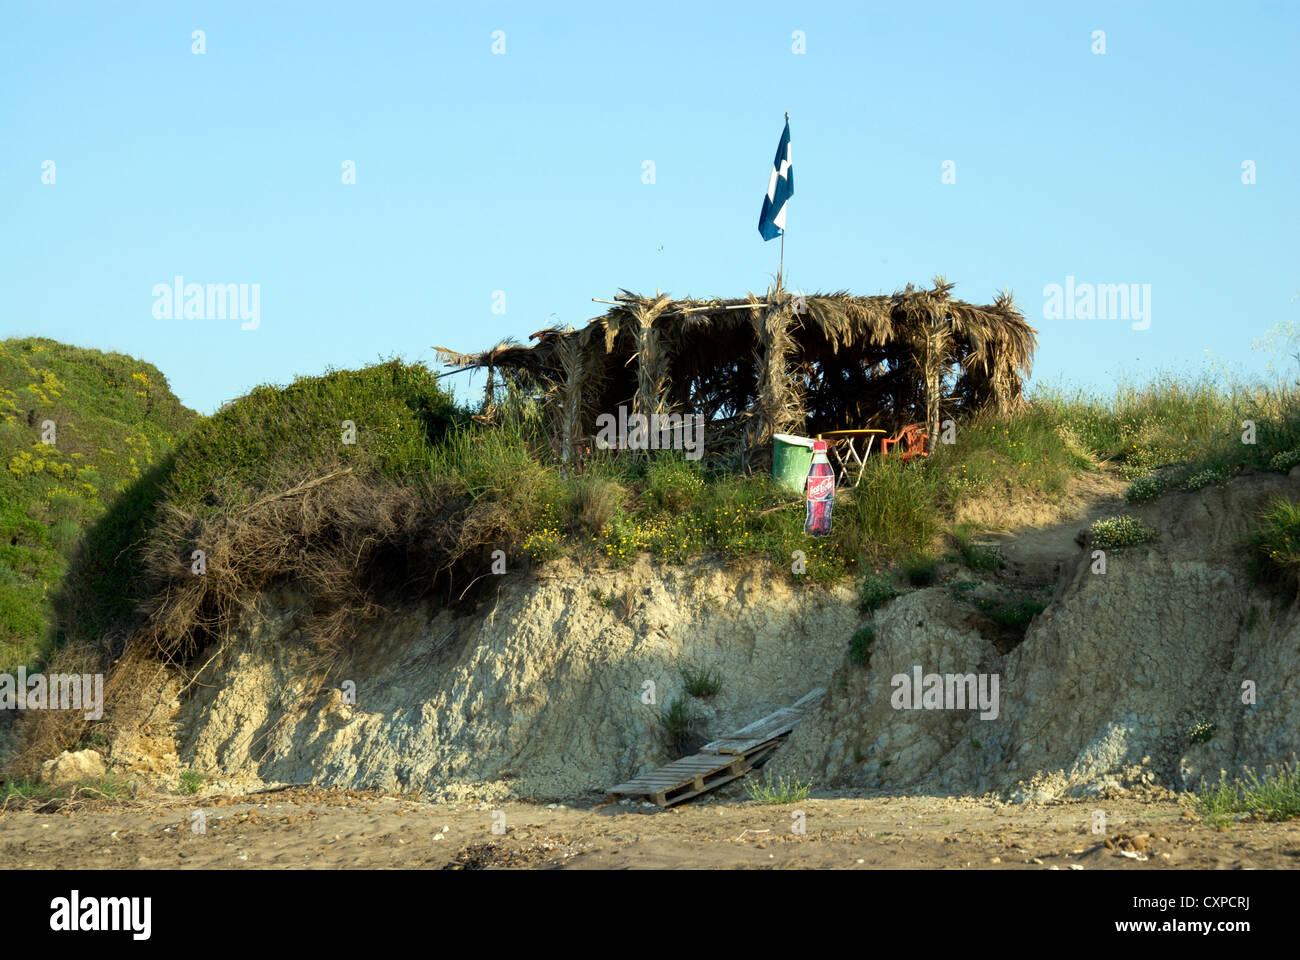 beach side snack bar crystal beach kalamaki zante / kakynthos ionian islands greece - Stock Image